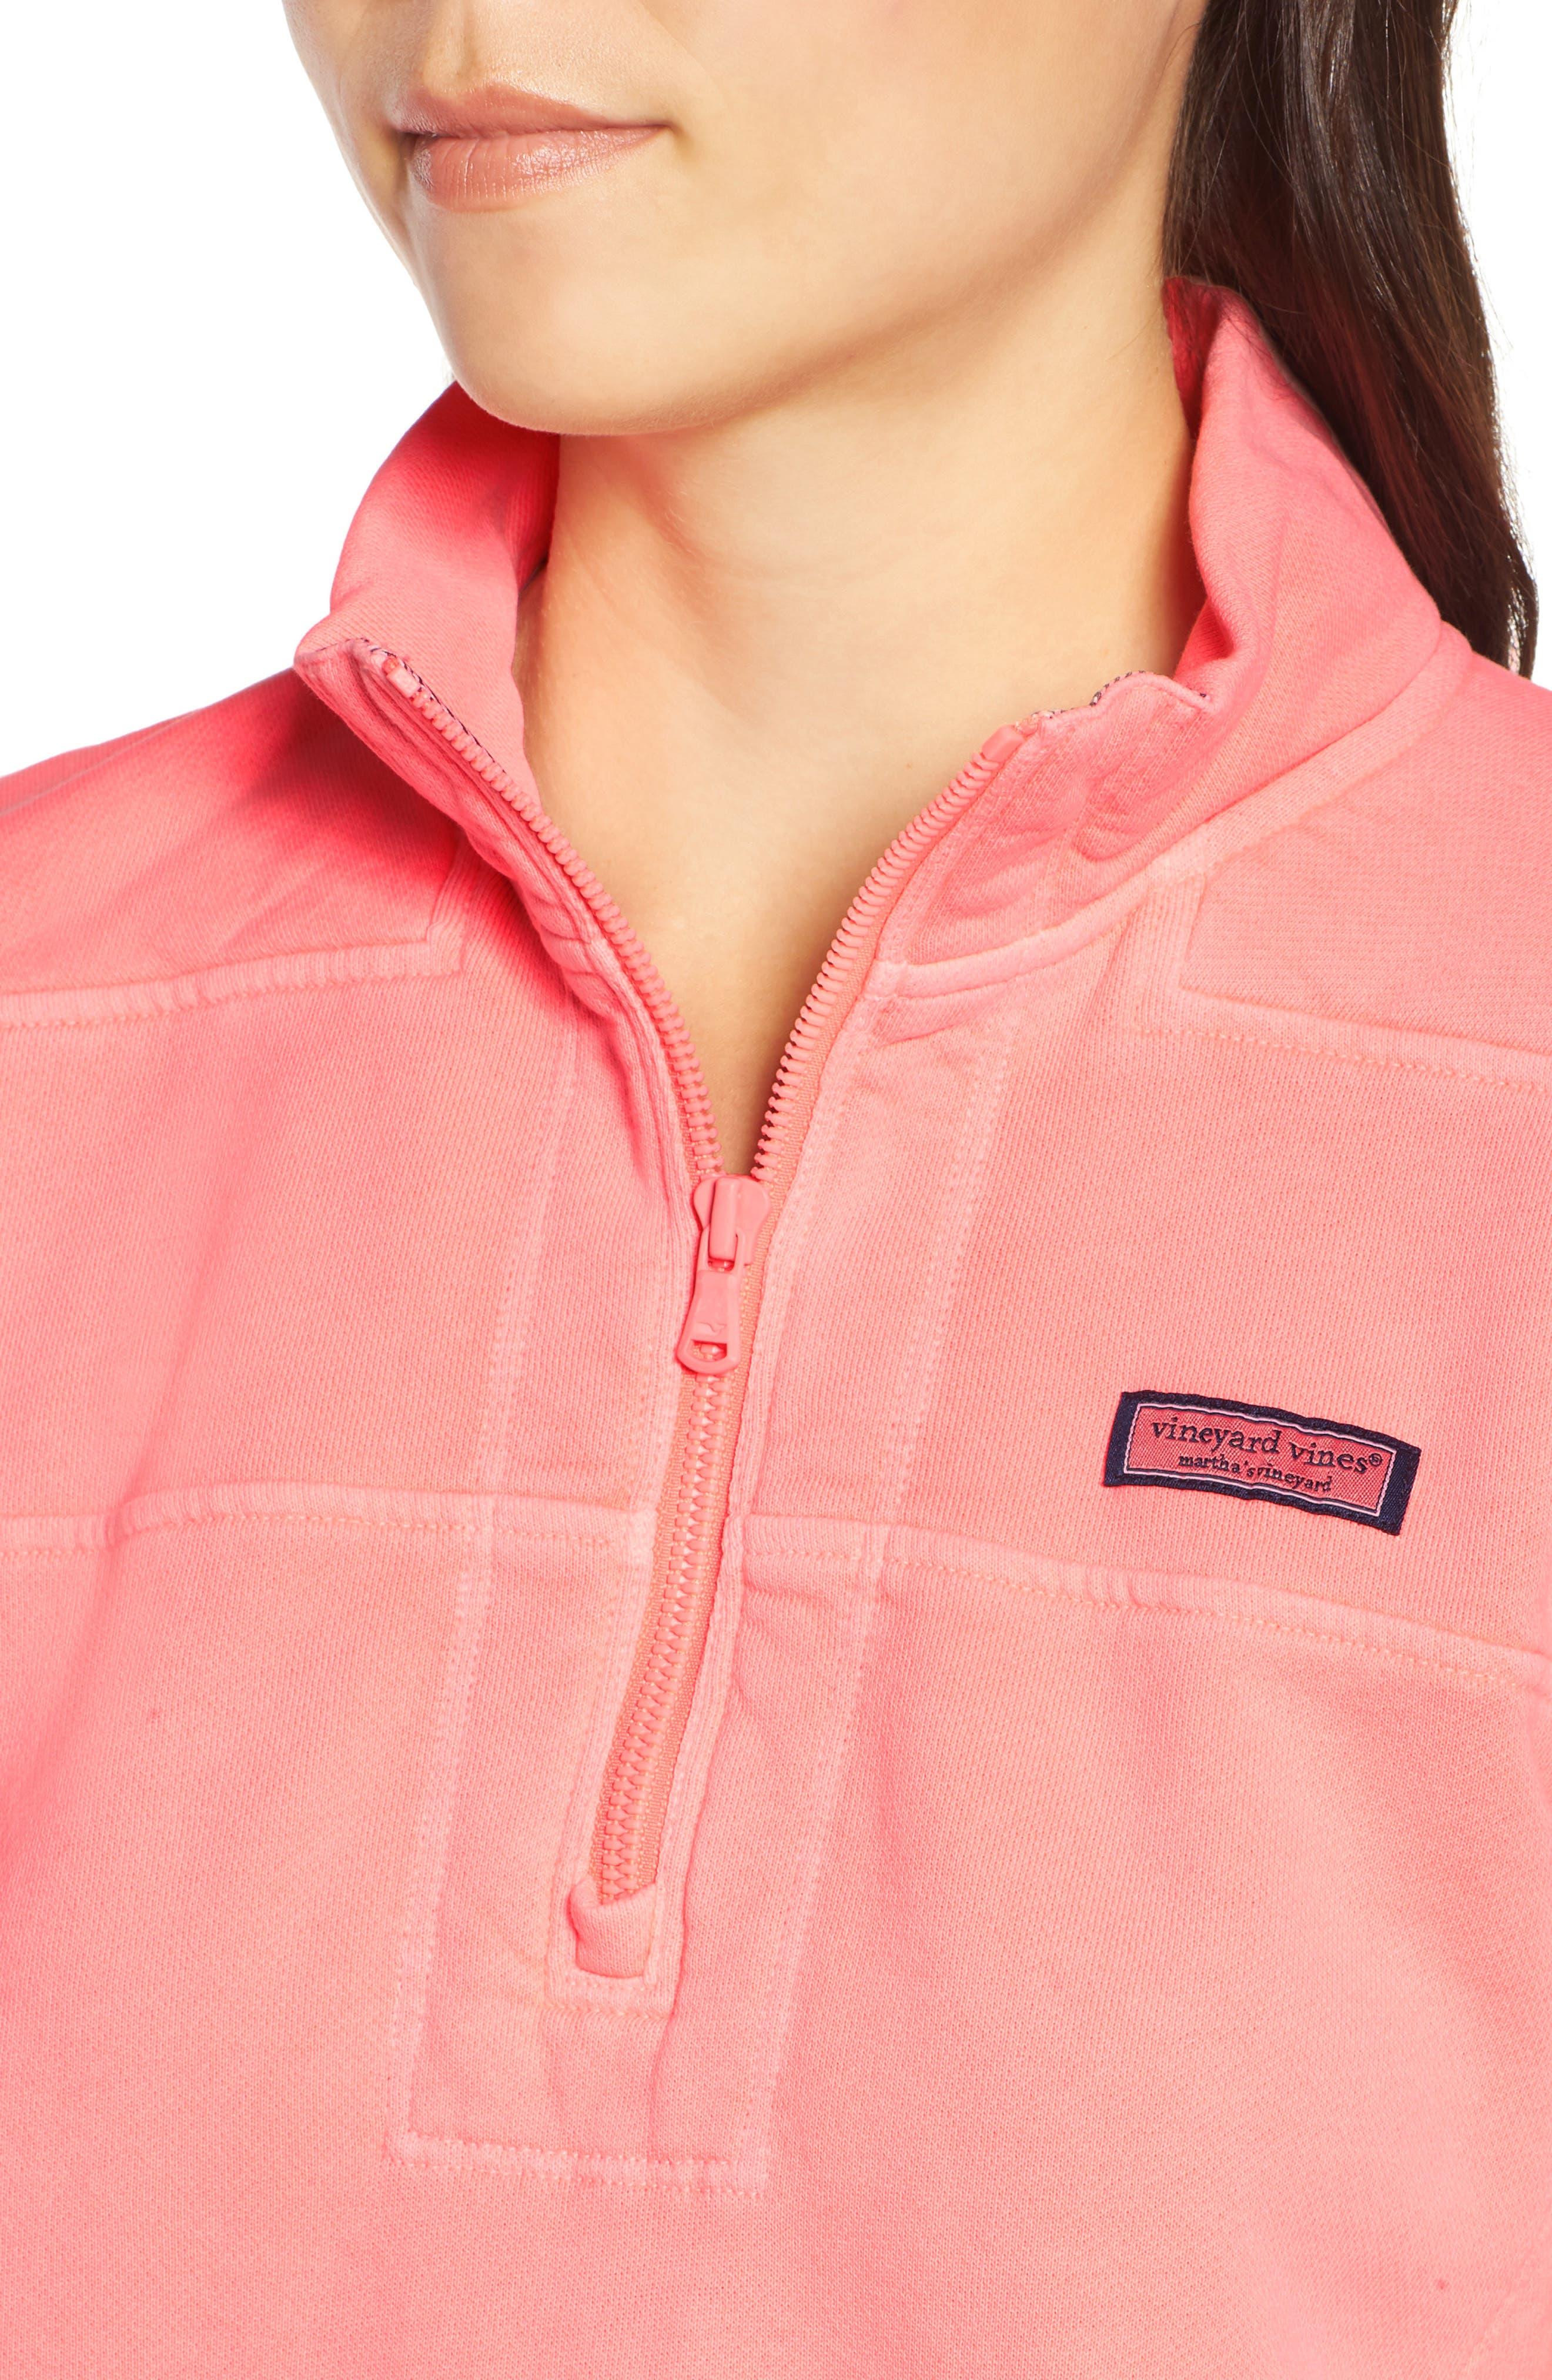 VINEYARD VINES,                             Garment Dyed Classic Shep Pullover,                             Alternate thumbnail 4, color,                             655